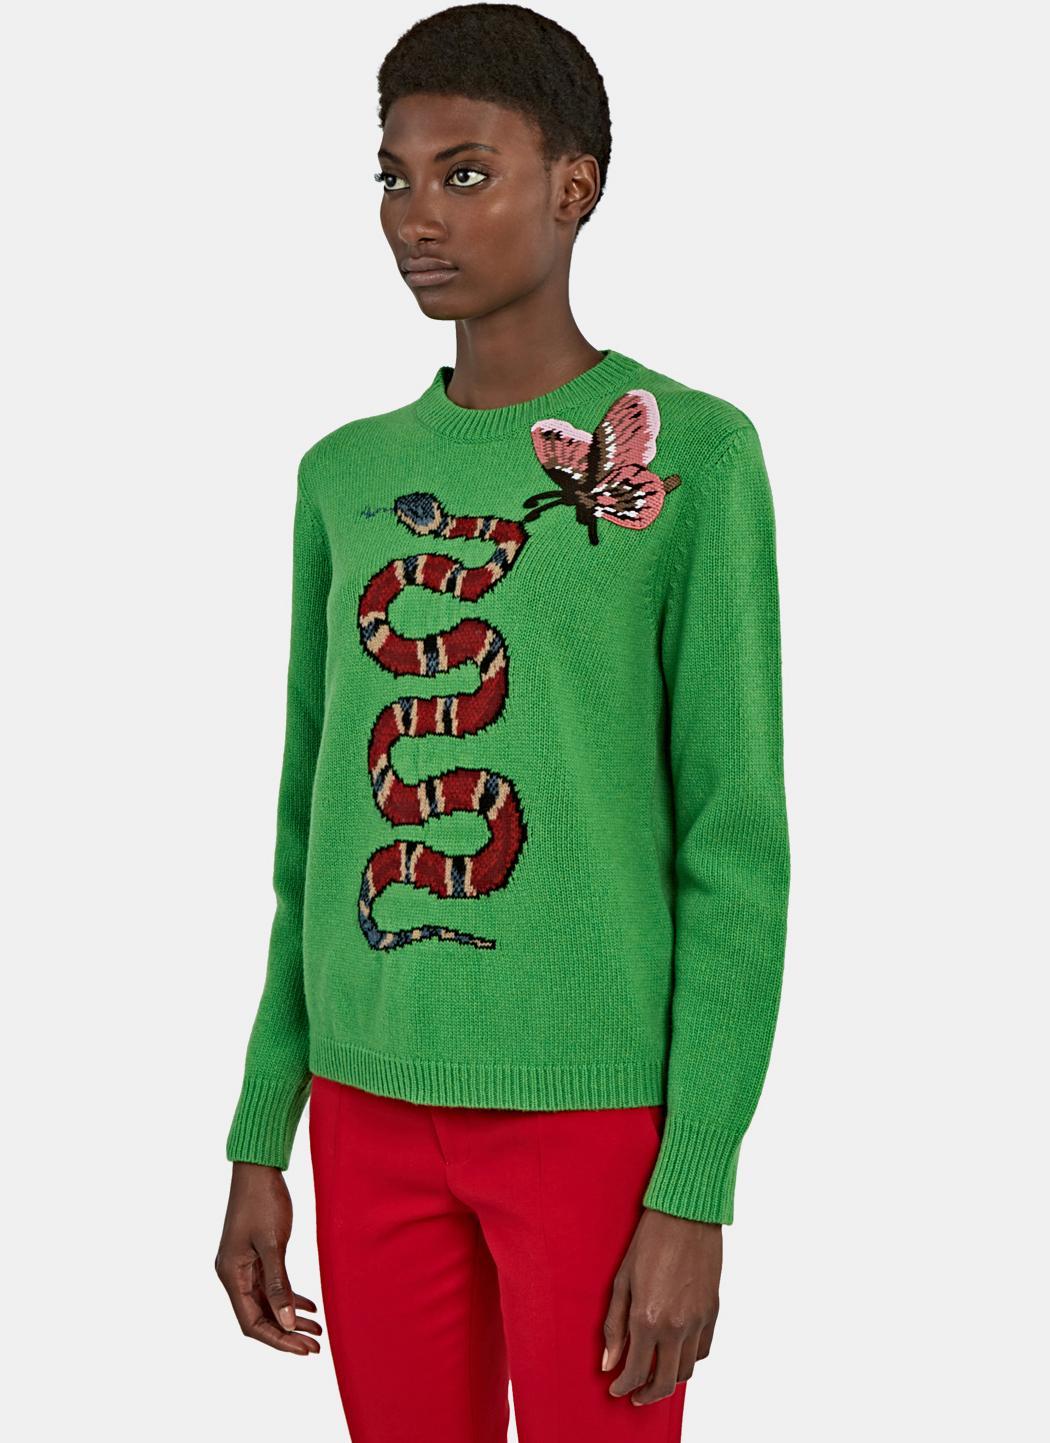 Lyst - Gucci Women s Snake Intarsia Knit Crew Neck Sweater In Green 0f67eeddf5